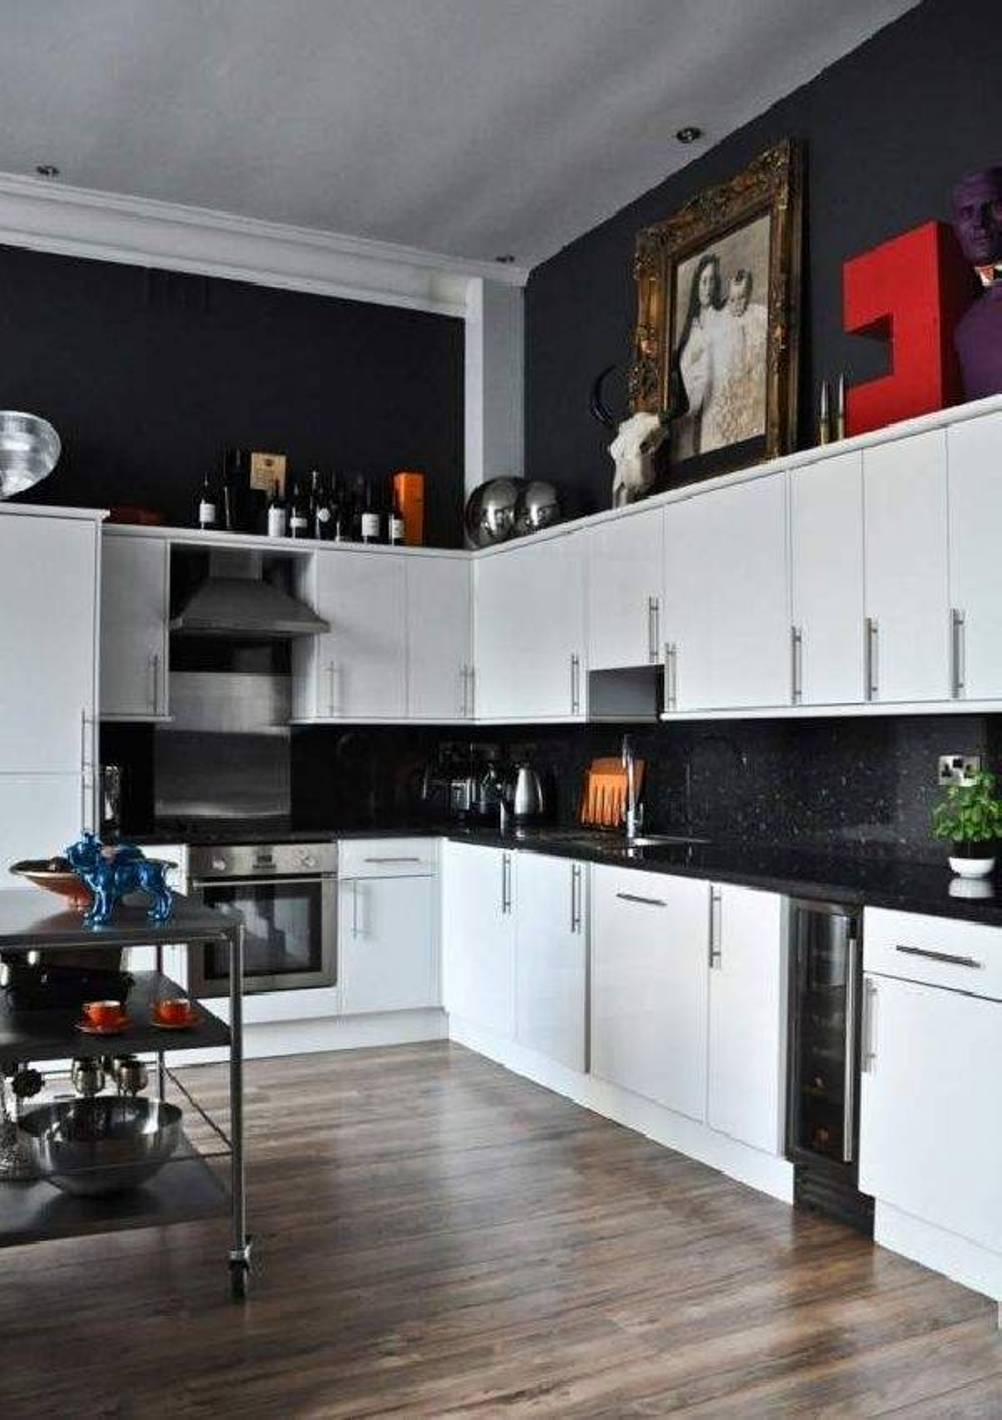 Fullsize Of Black Kitchen Decor